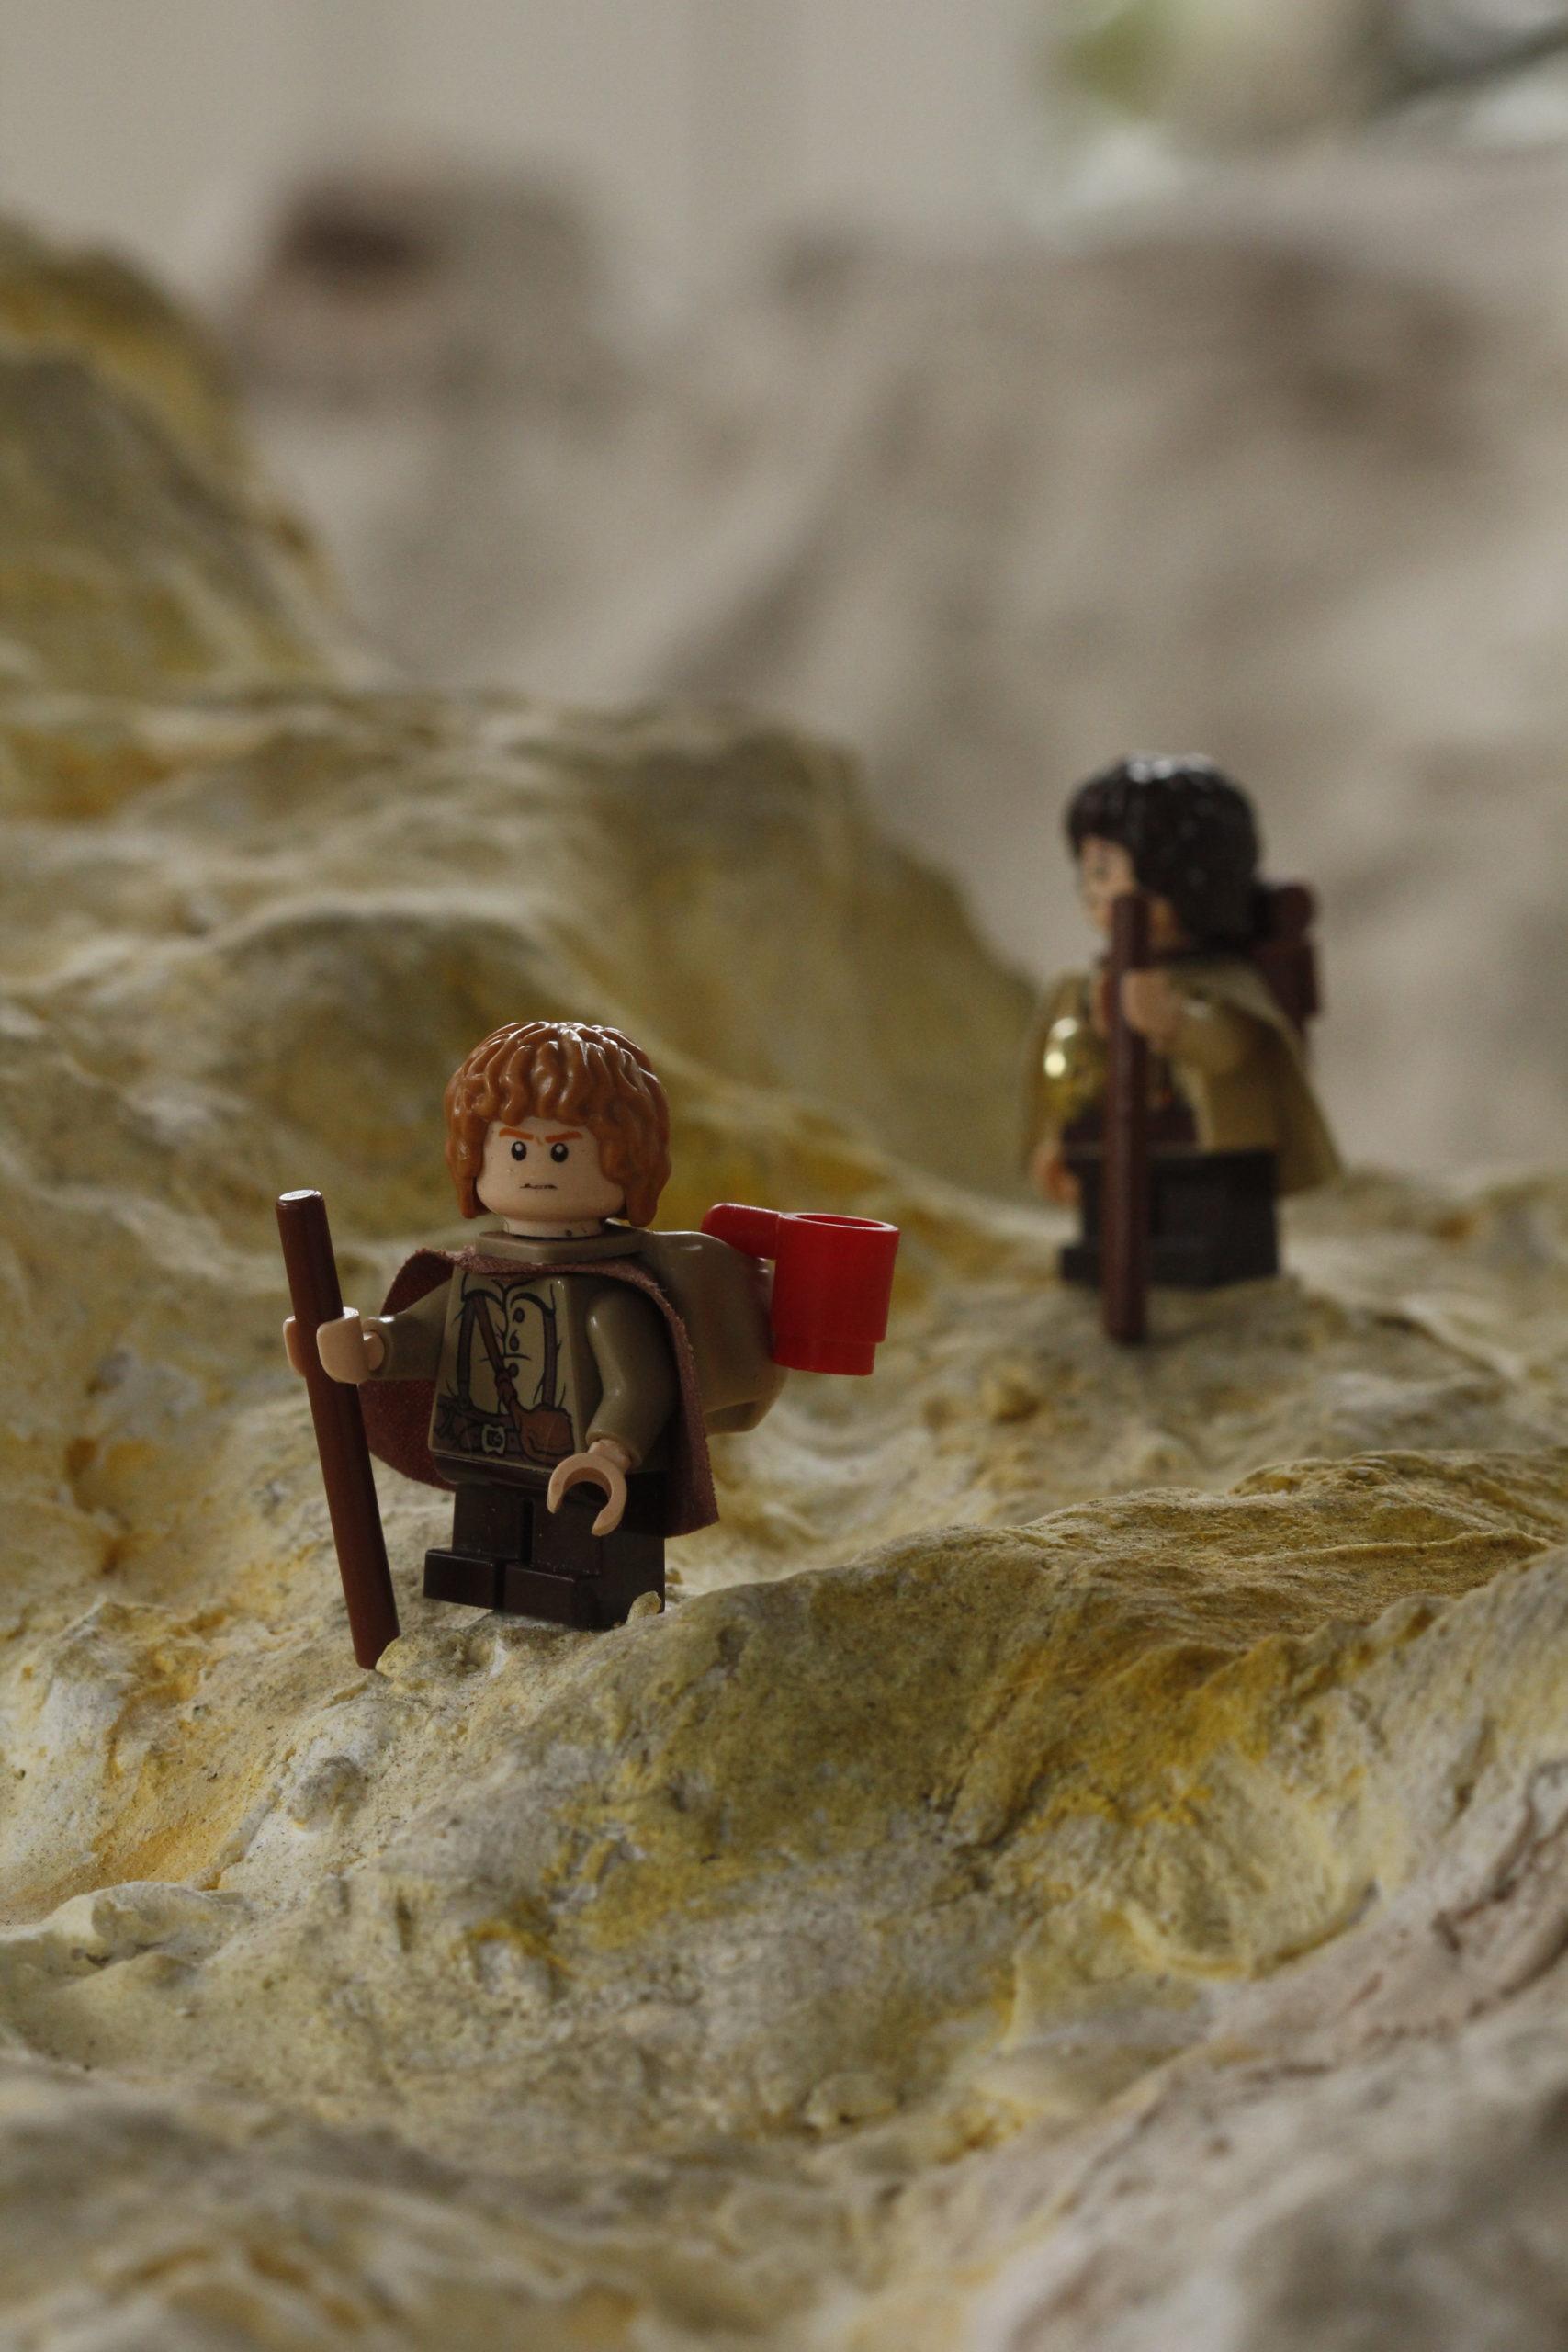 lego inspiring creativity: two hobbits